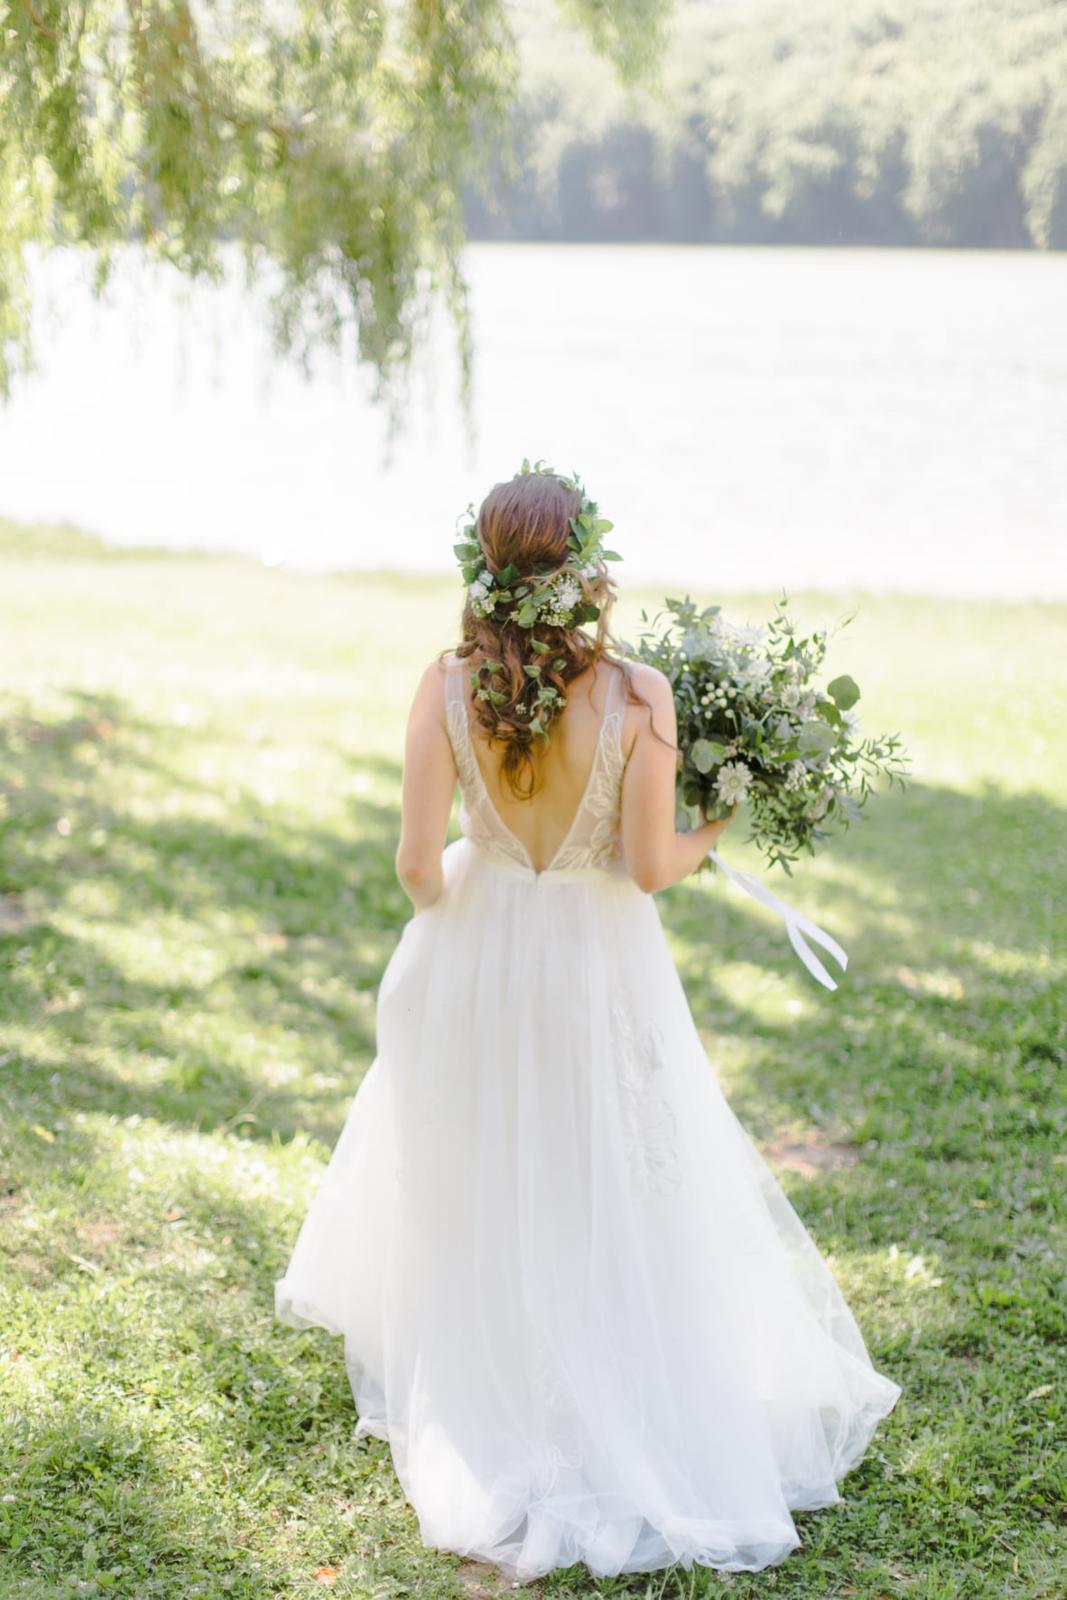 Svadba 21.8.2020 Podvišňové - foto: Daniel Nedeliak